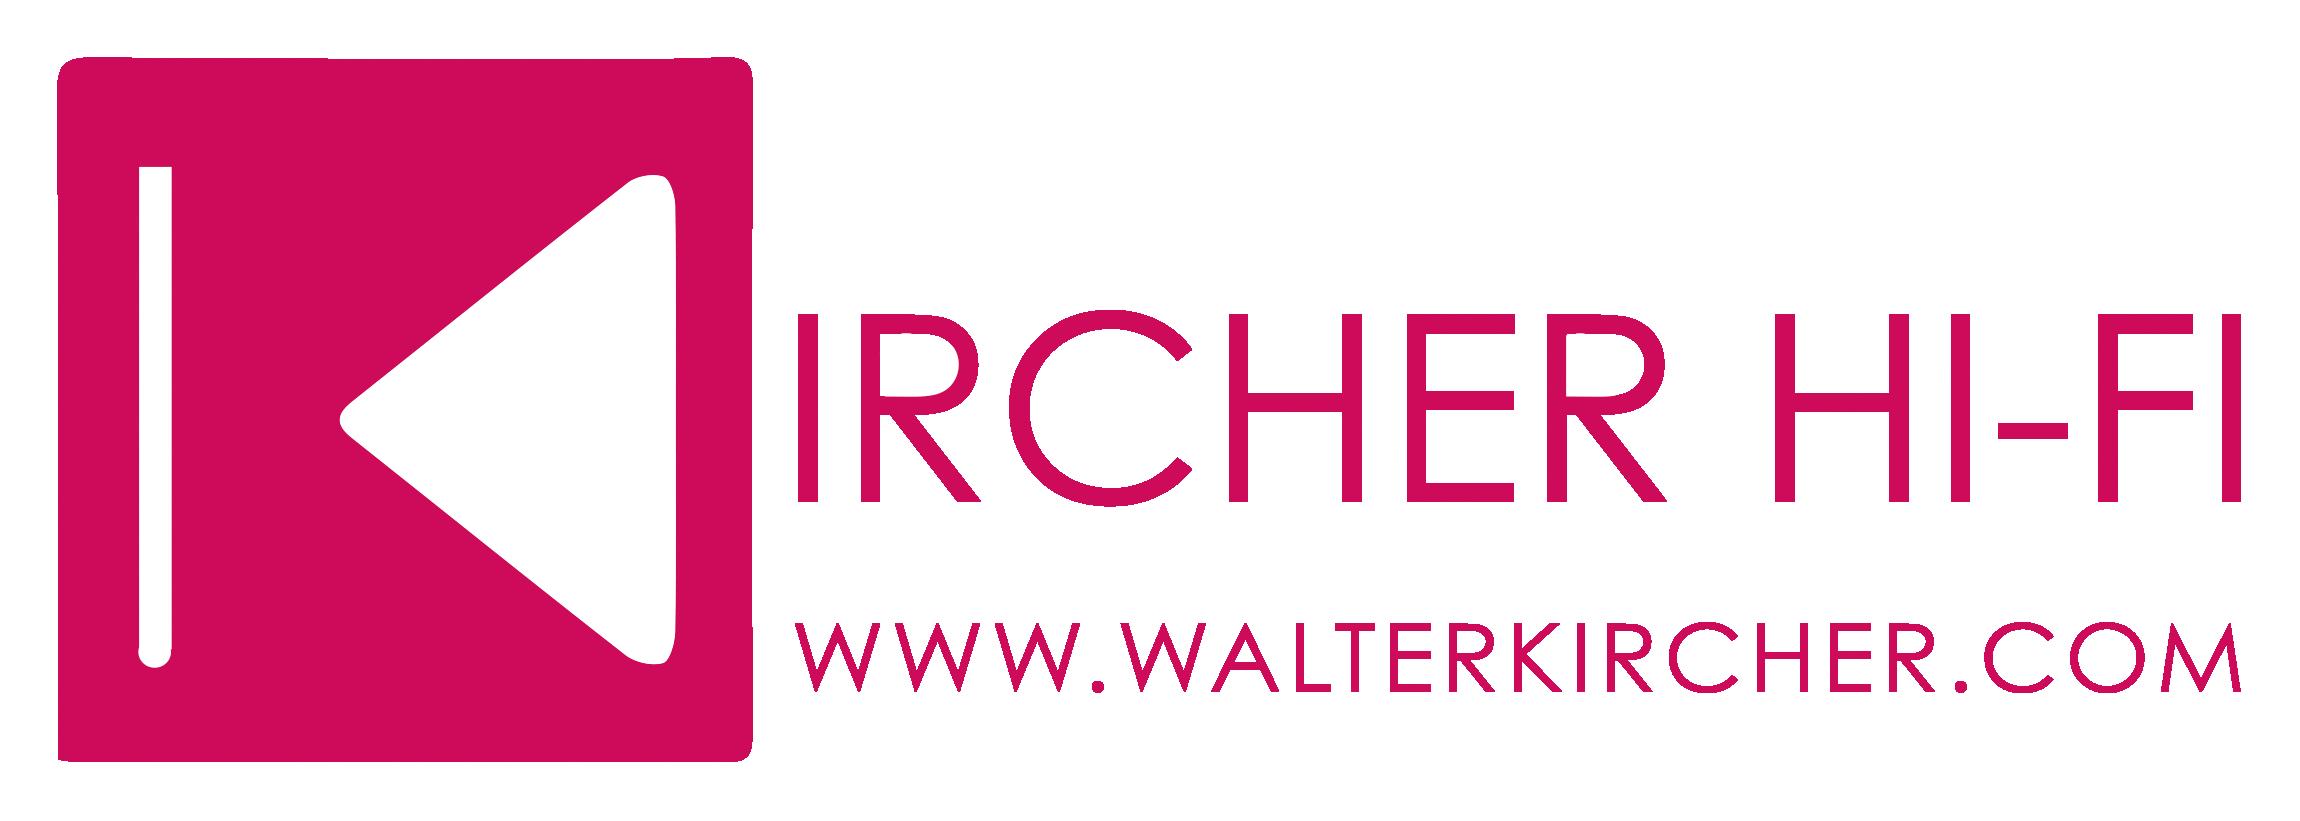 Kircher HiFi Distribution